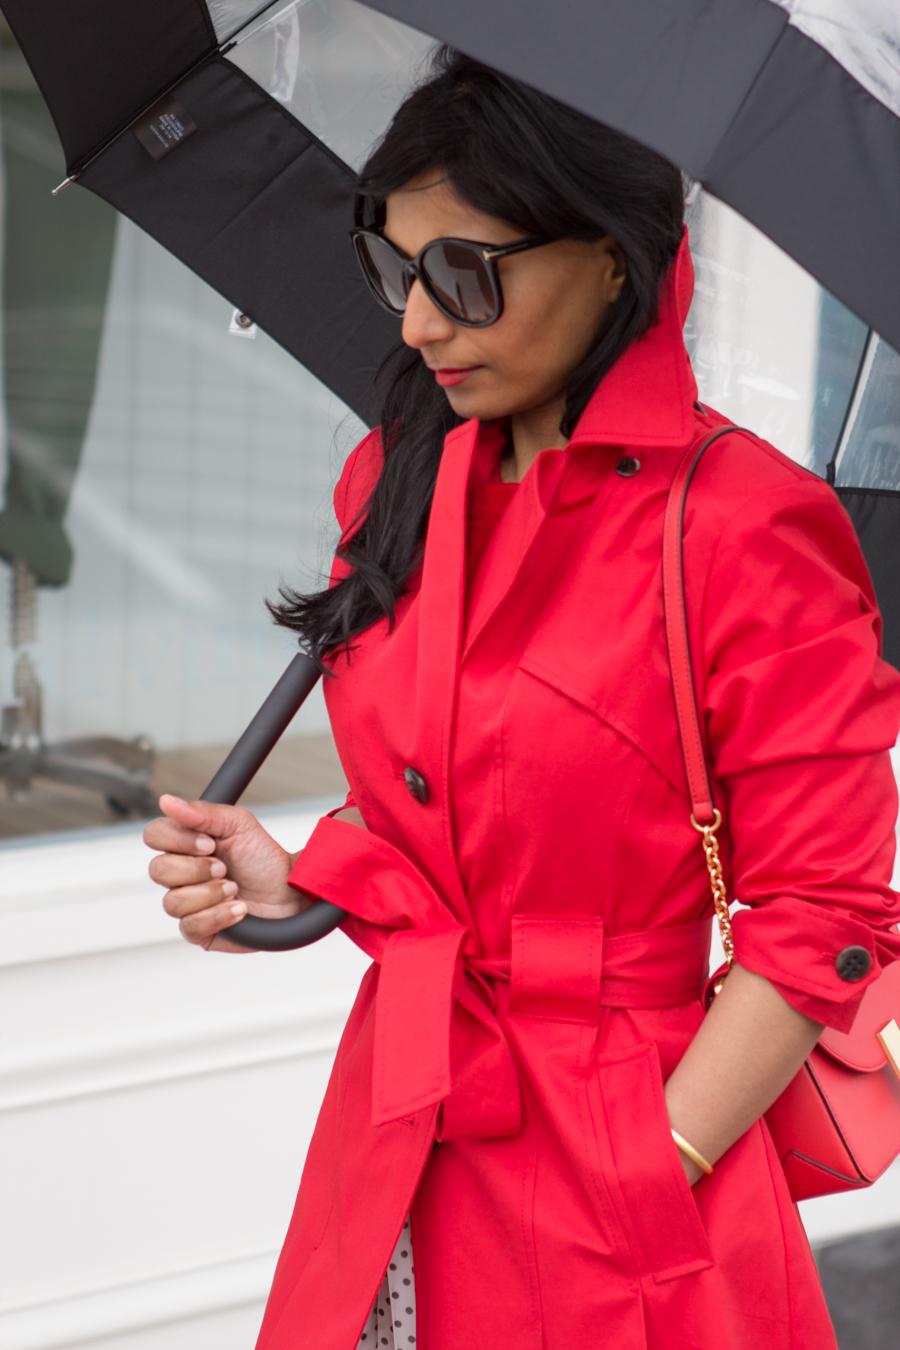 rainy day style, trench coat, red coat, raincoat, single-breasted trench, bright red coat, petite raincoat, red bag, cross-body bag, flynn, hunter, rainwear, mommy style, mom style, elegant look, chic, street style, white pumps, polka dot, umbrella